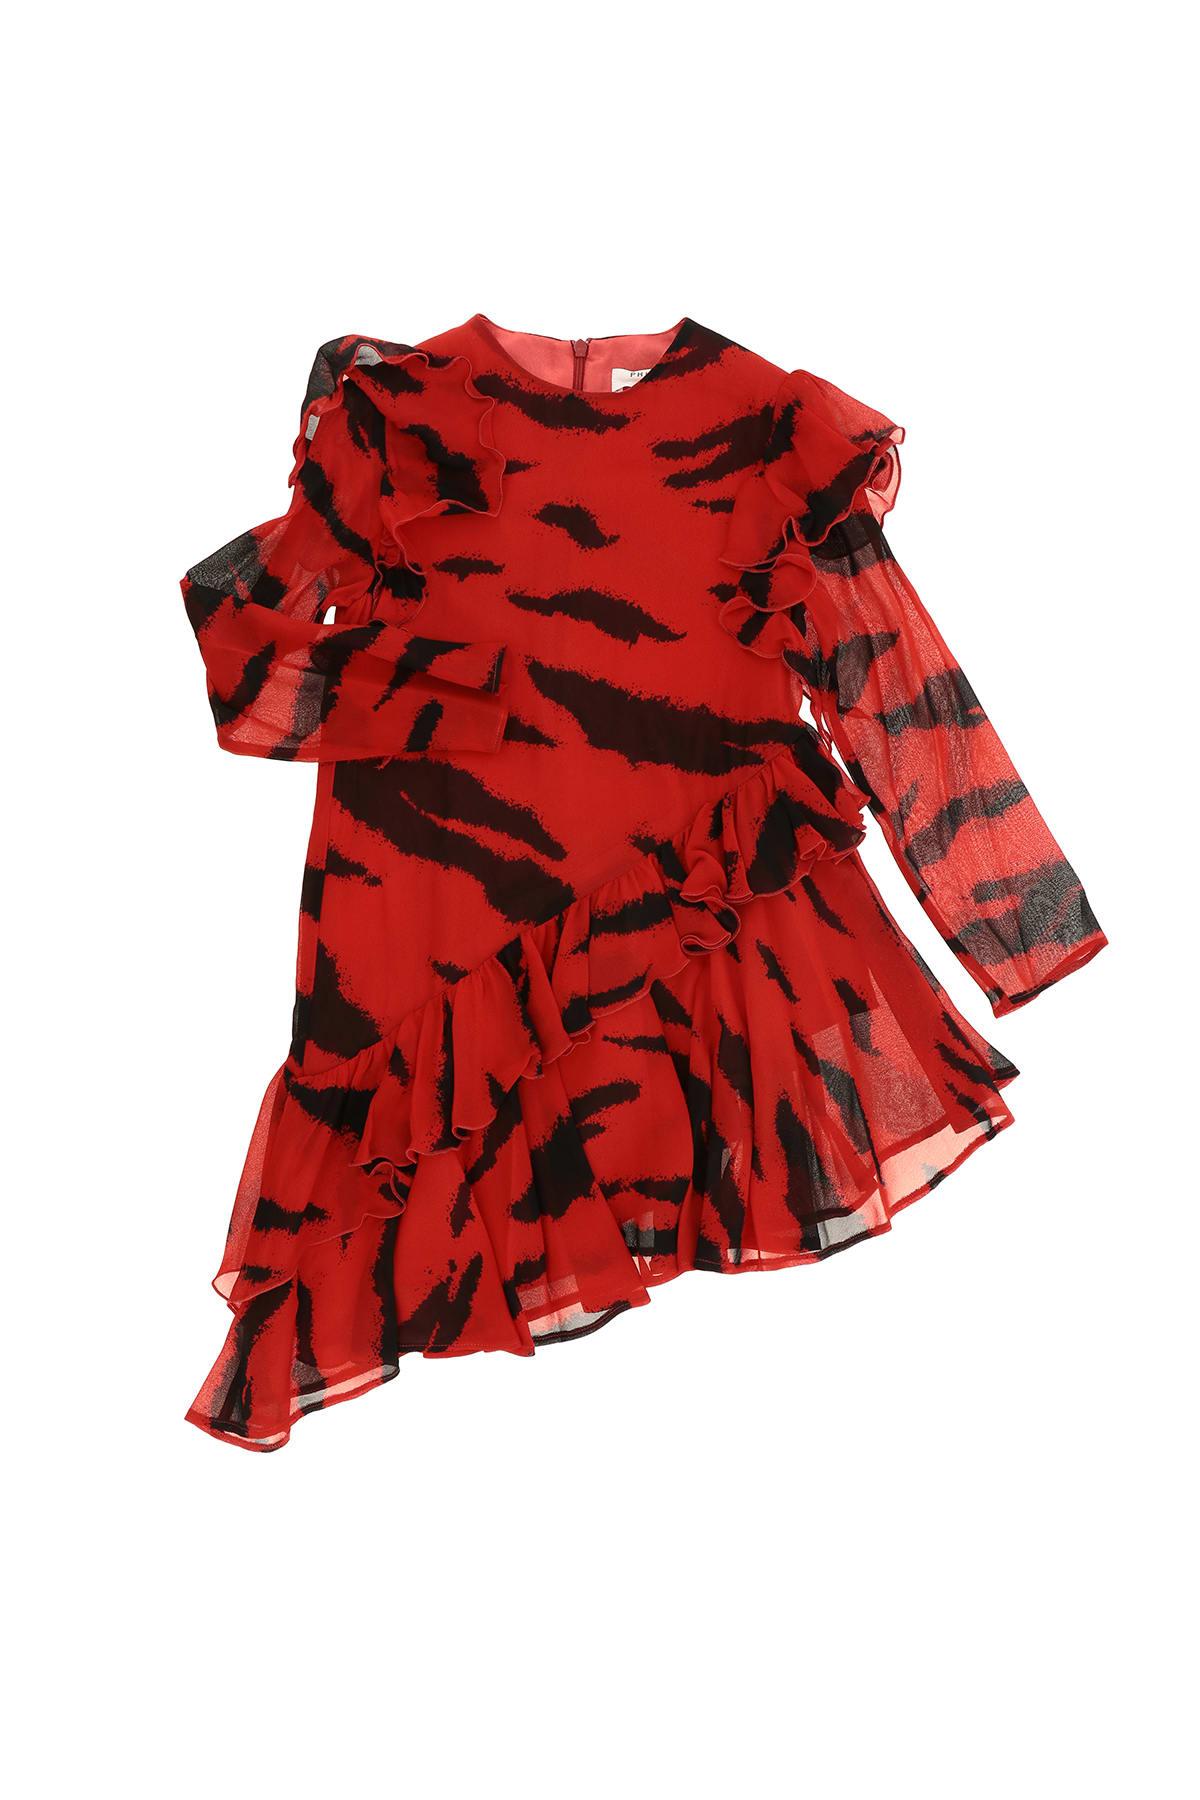 Buy Philosophy di Lorenzo Serafini Kids Tiger Dress online, shop Philosophy di Lorenzo Serafini Kids with free shipping